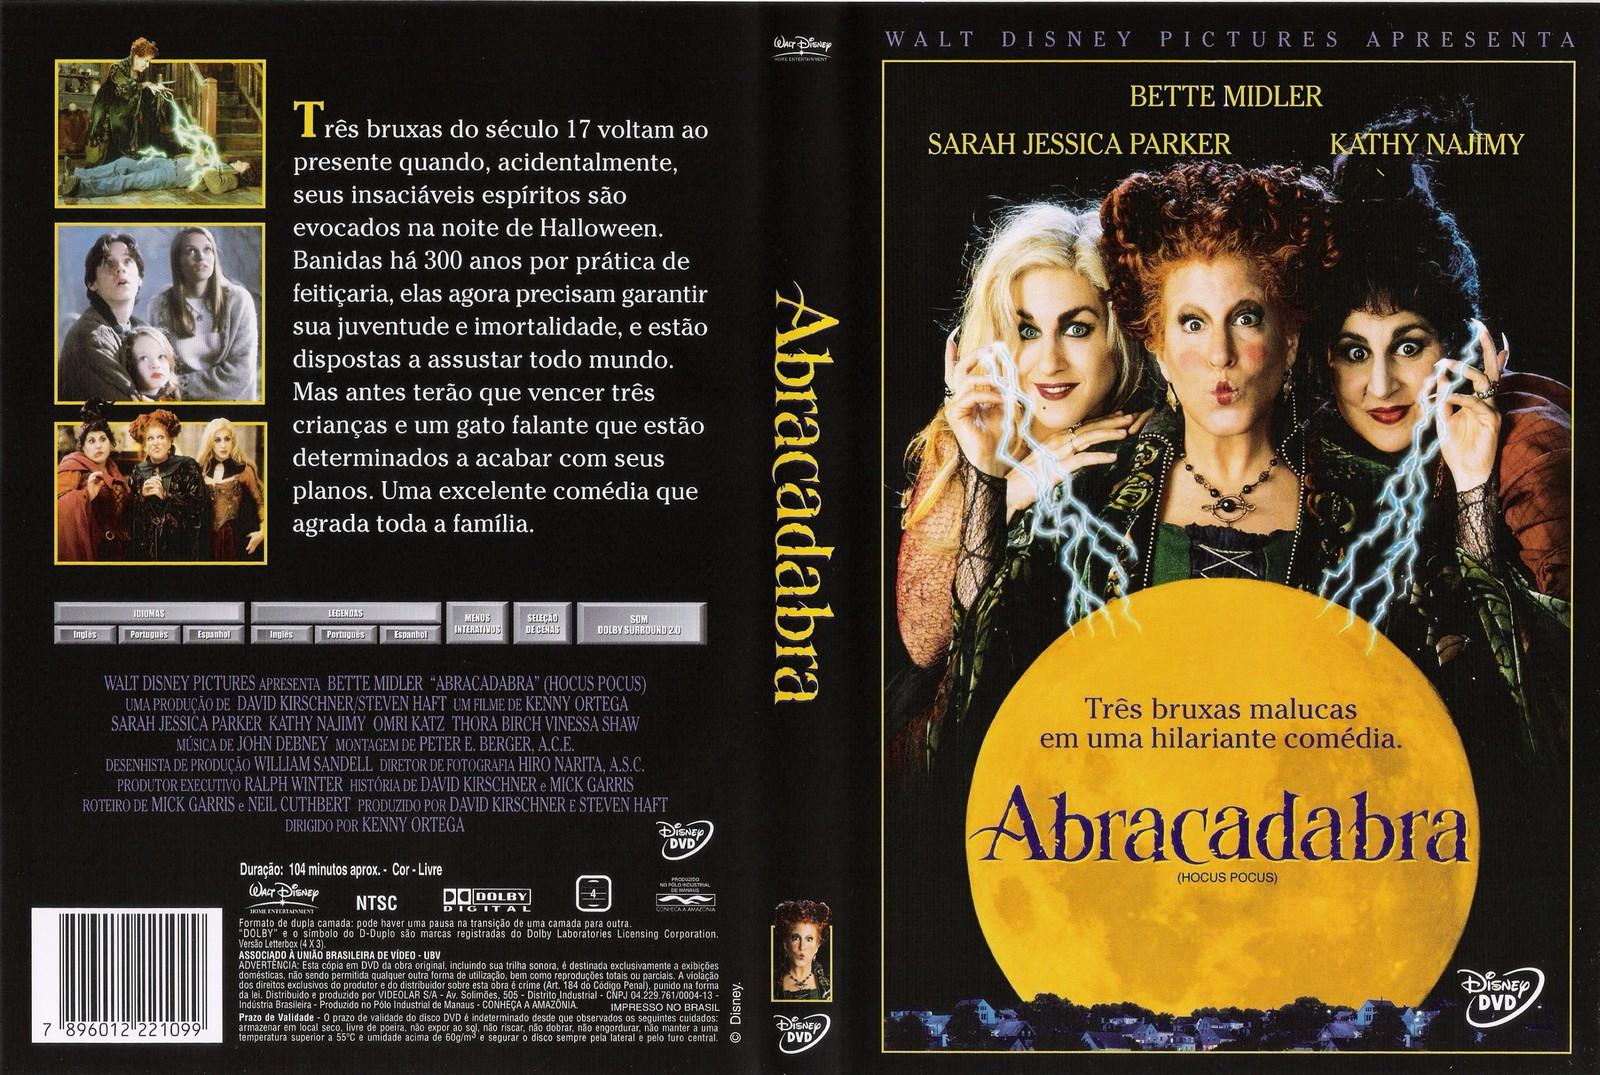 CAPA ALTEZA BAIXAR DVD SUA